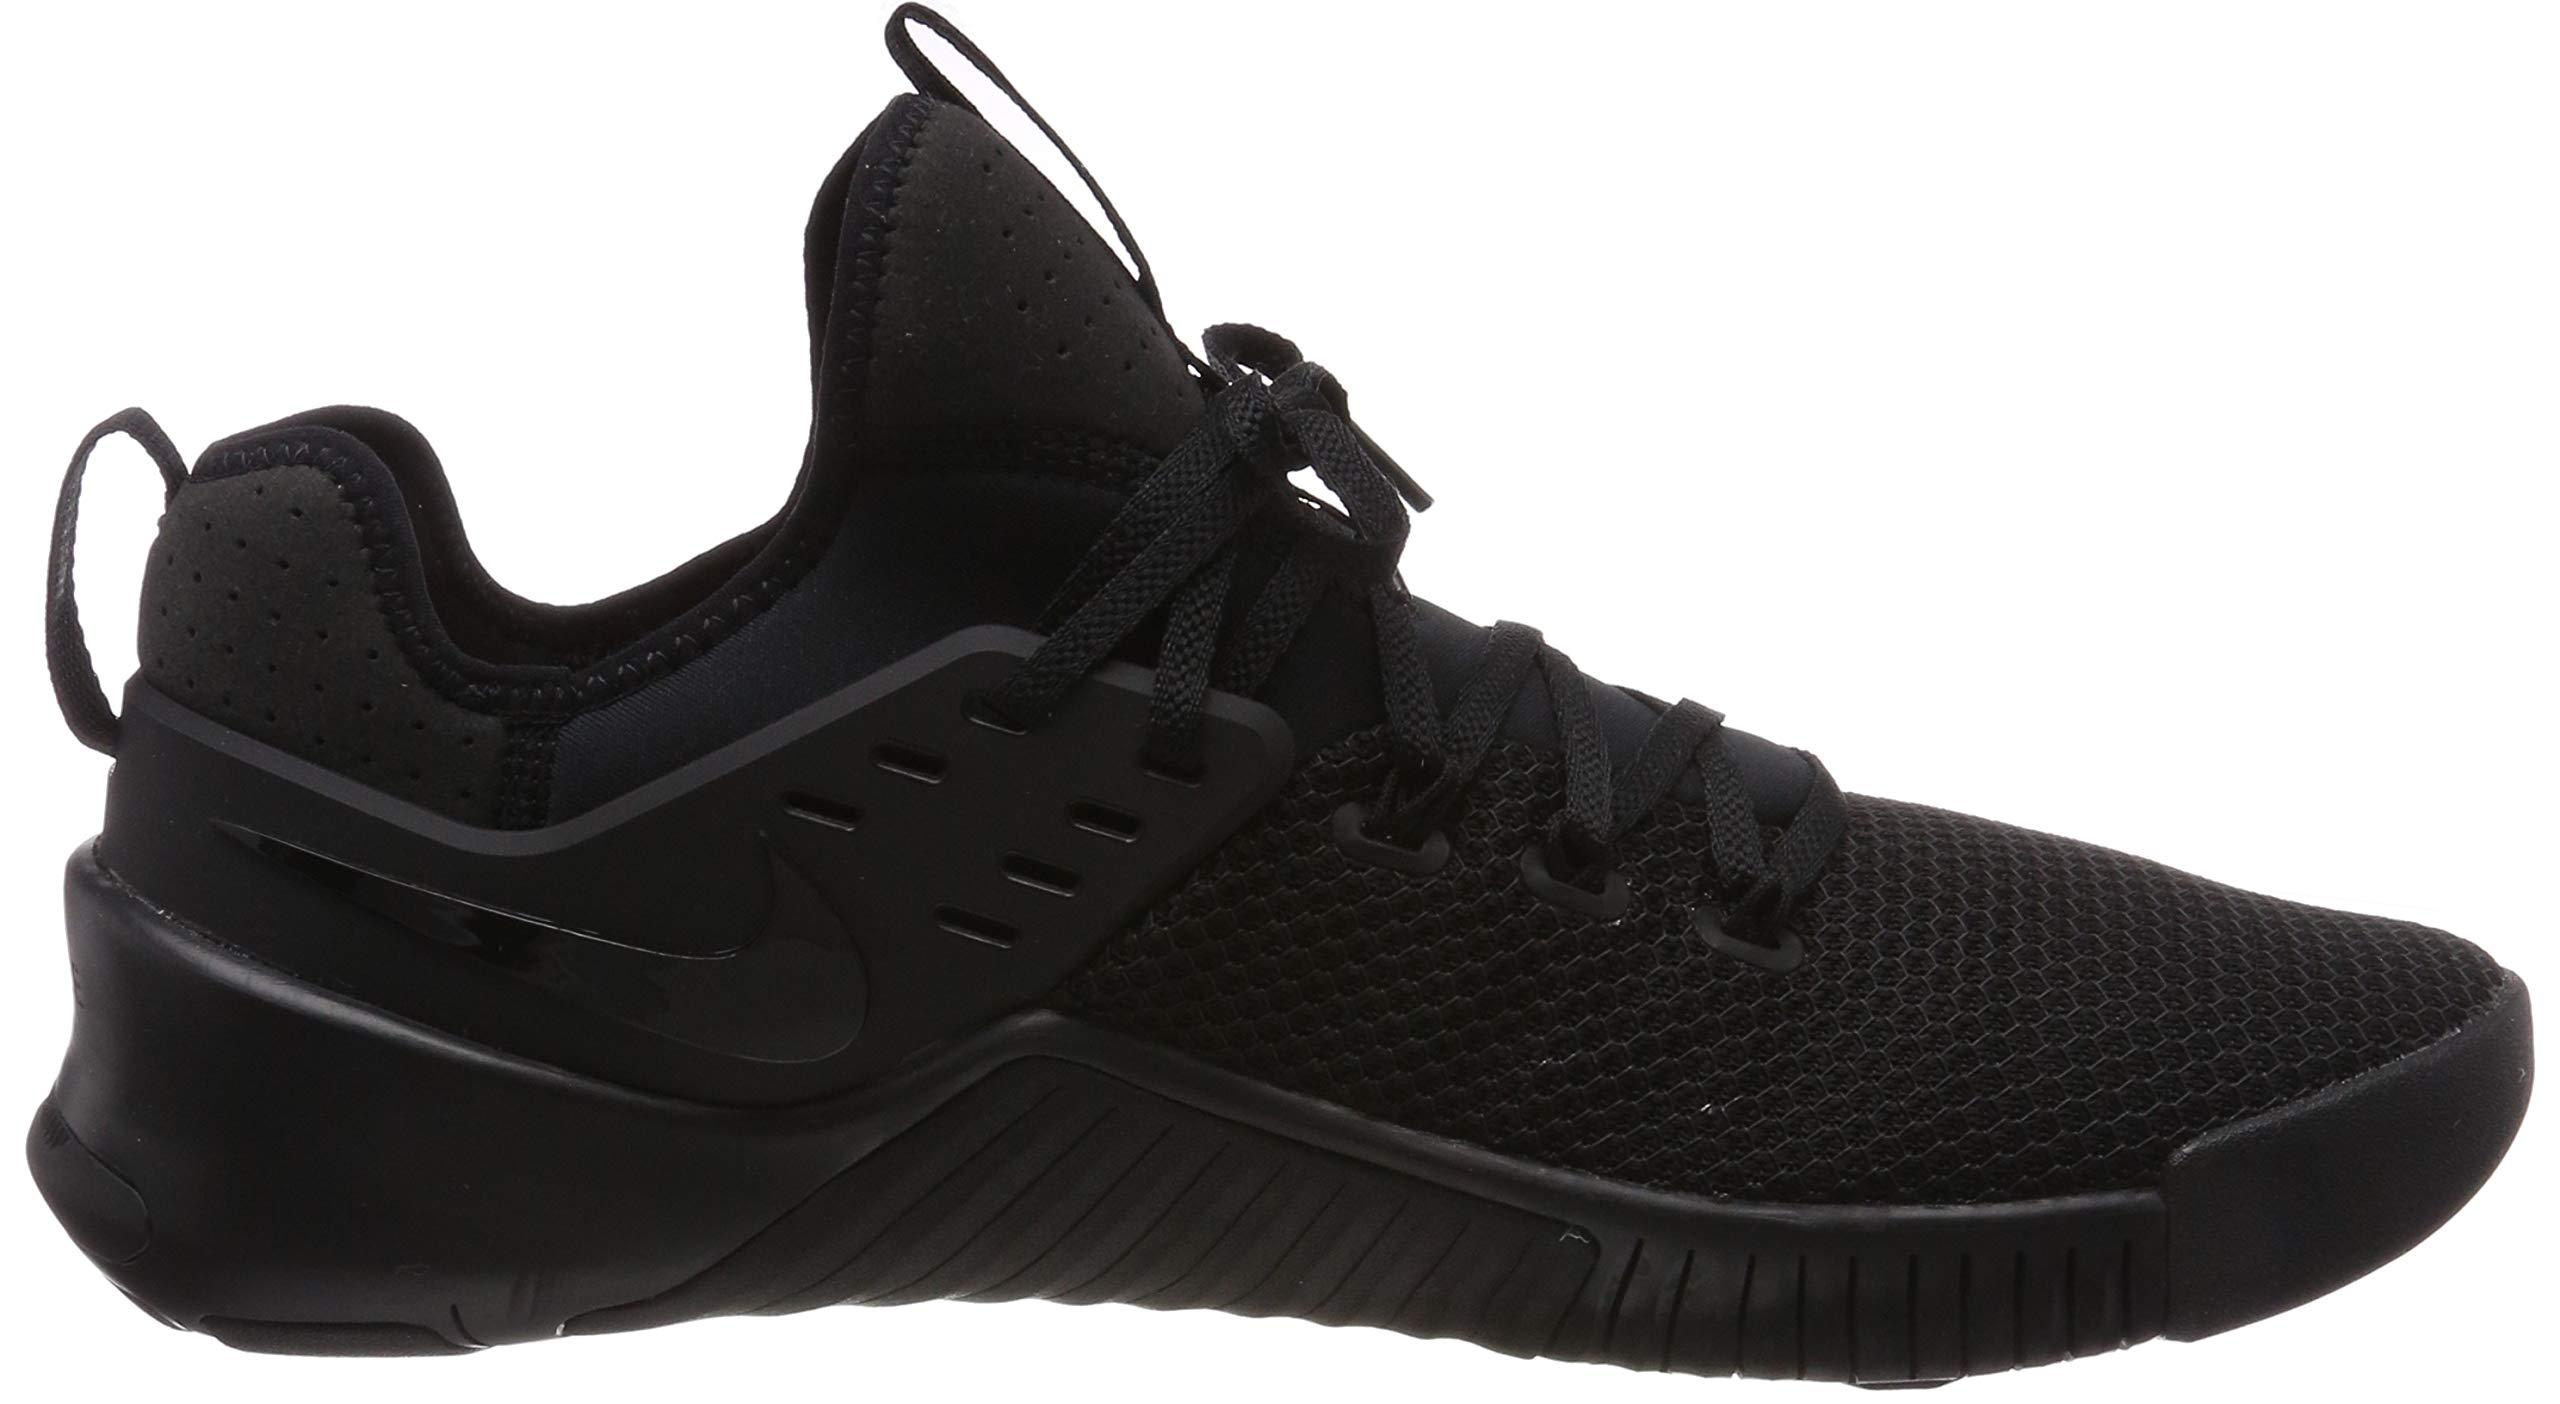 71doM5RaN%2BL - Nike Men's Herren Trainingsschuh Free X Metcon Fitness Shoes